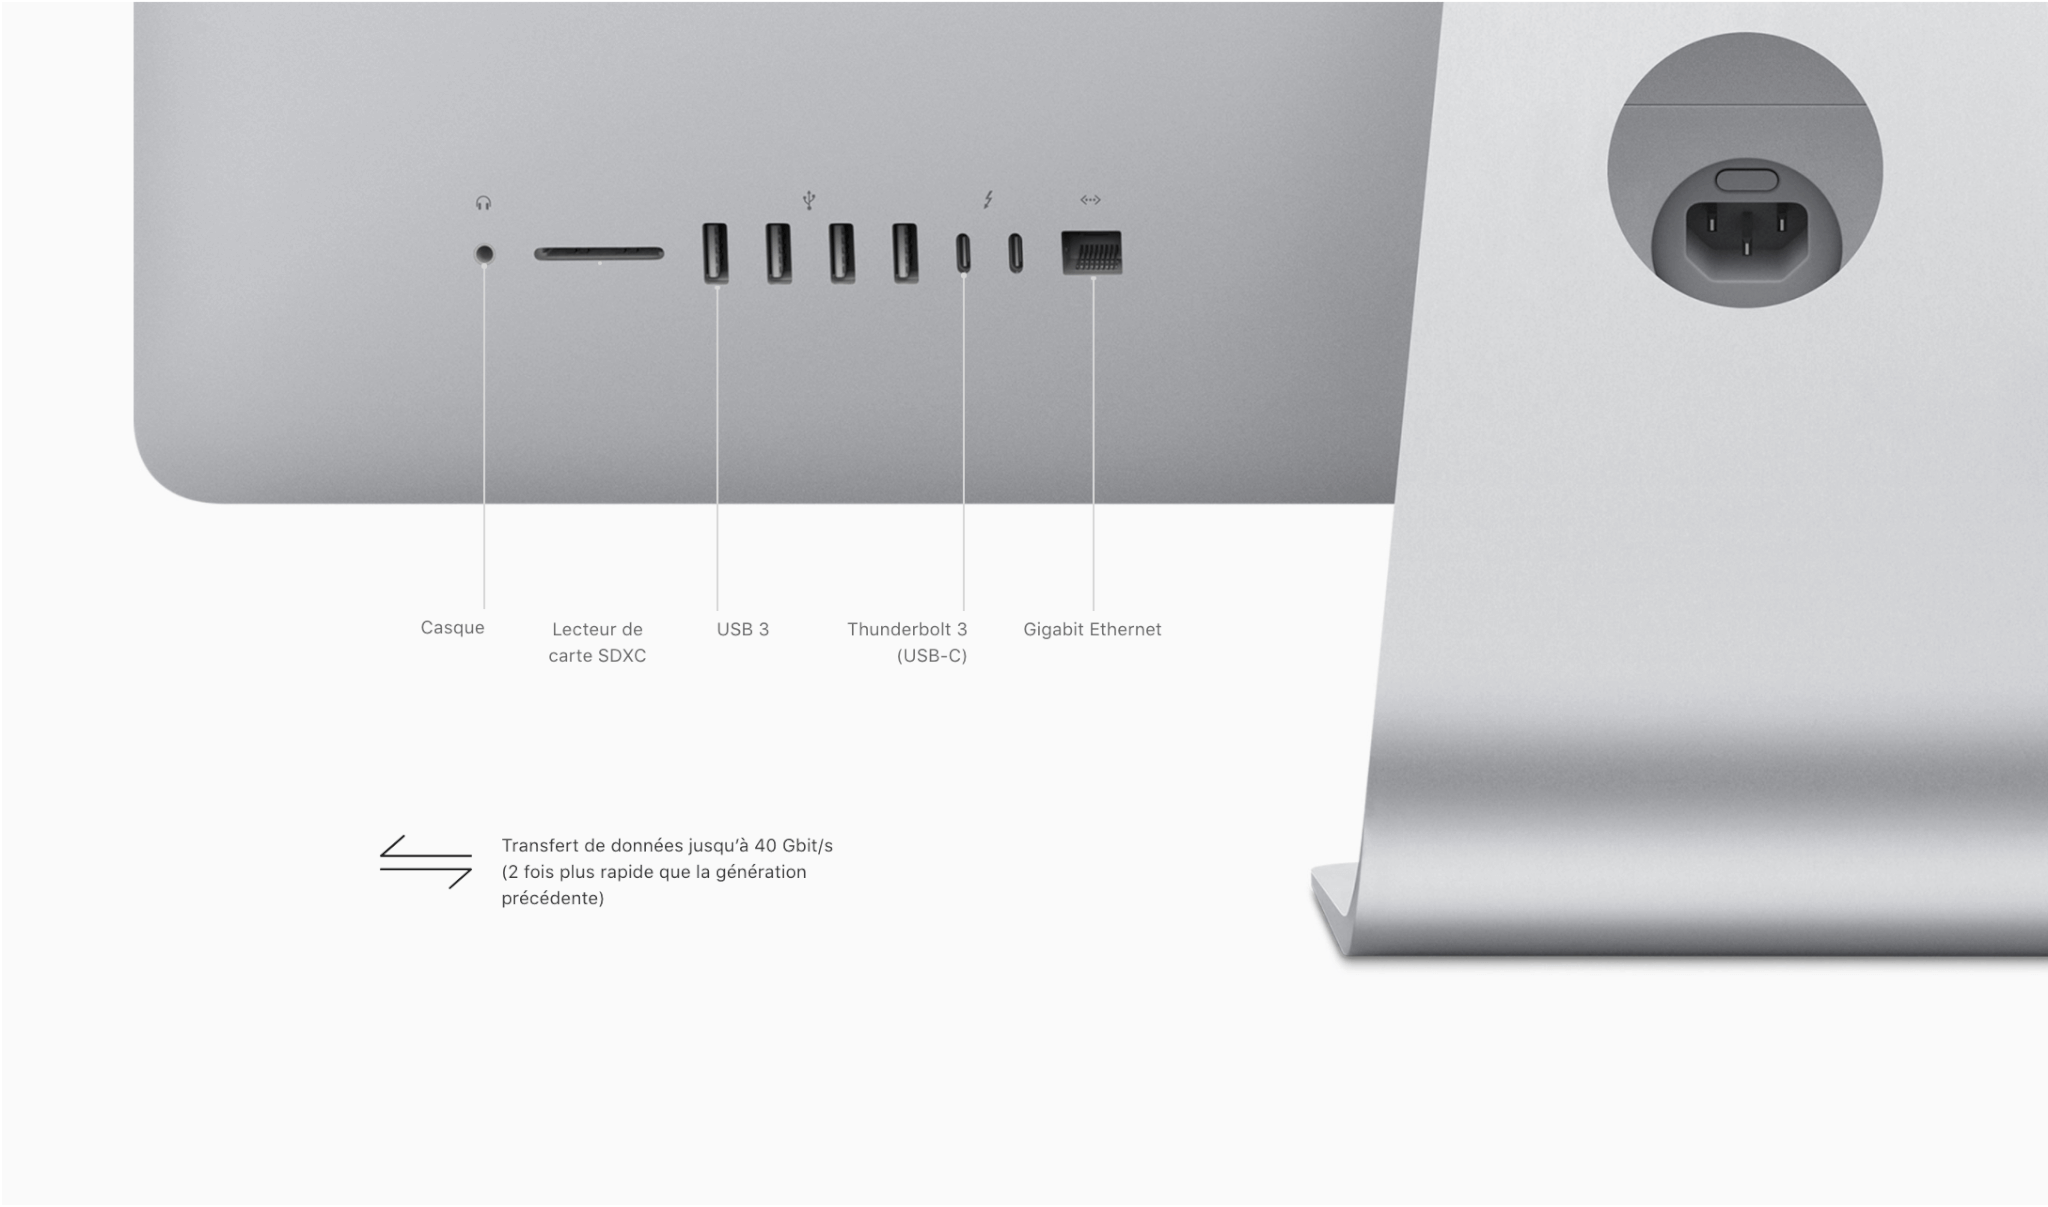 imac retina 4k 21 5 pouces 2017 perf bicomm informatique. Black Bedroom Furniture Sets. Home Design Ideas